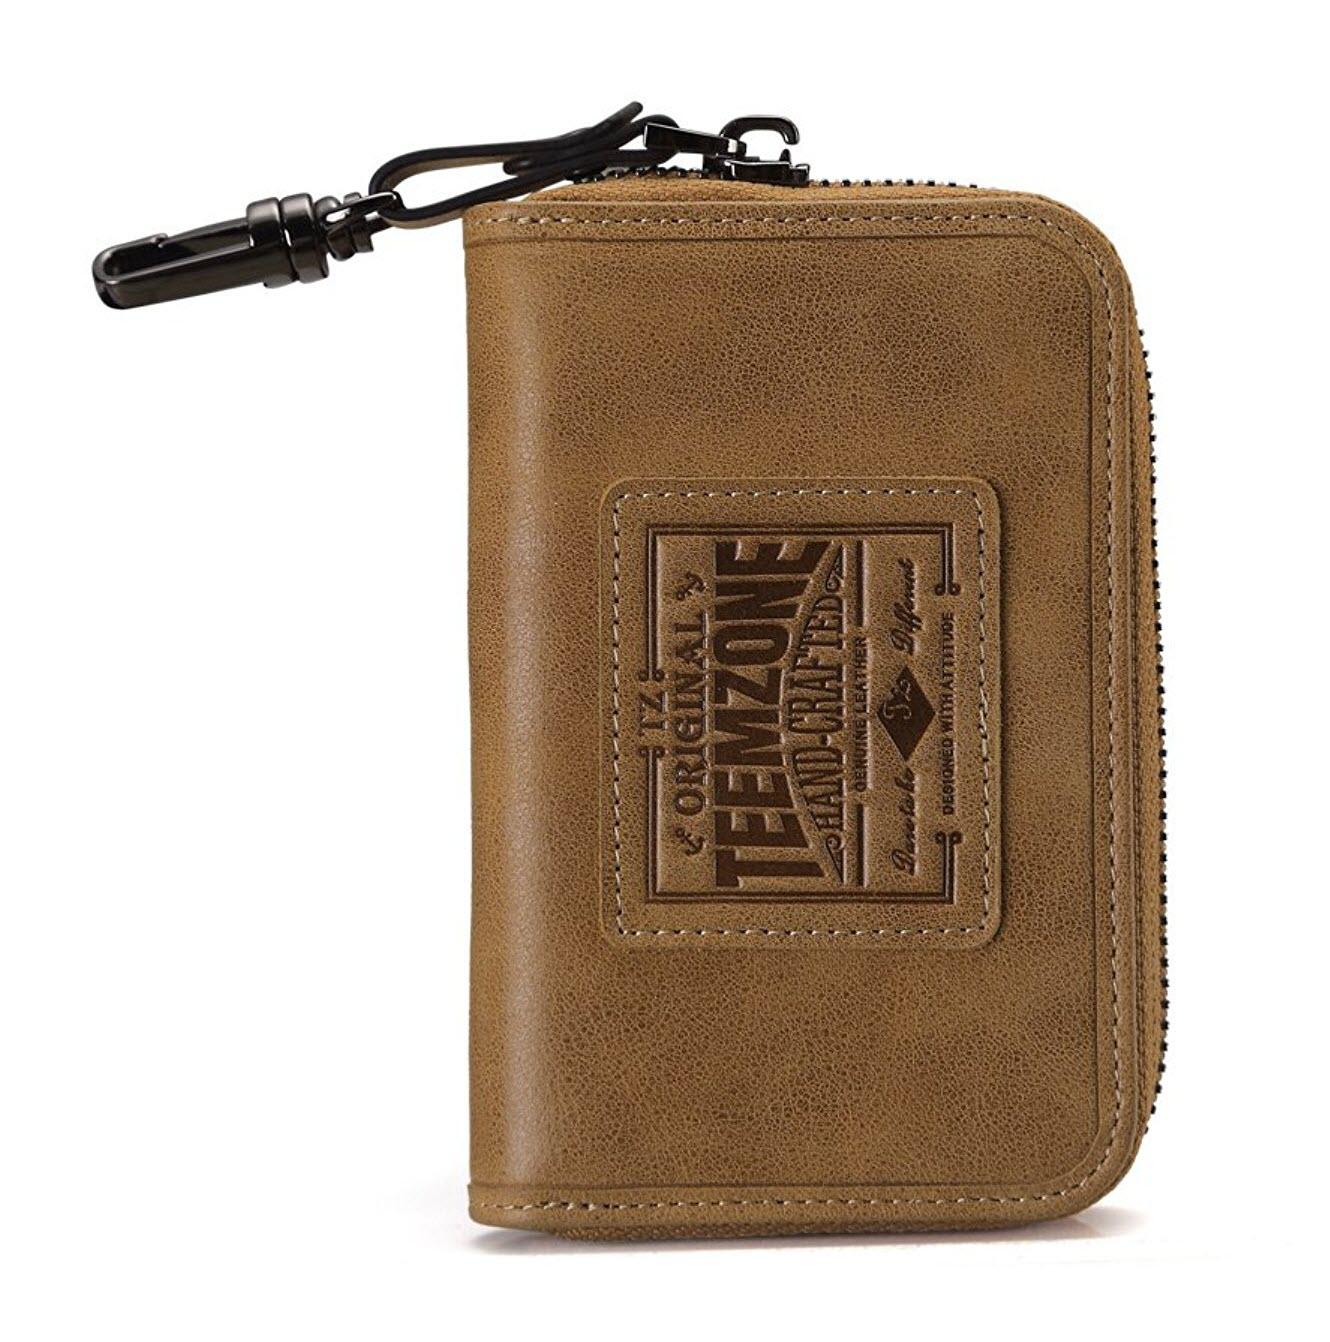 14 Best Mens Leather Zipper Wallet for 2020